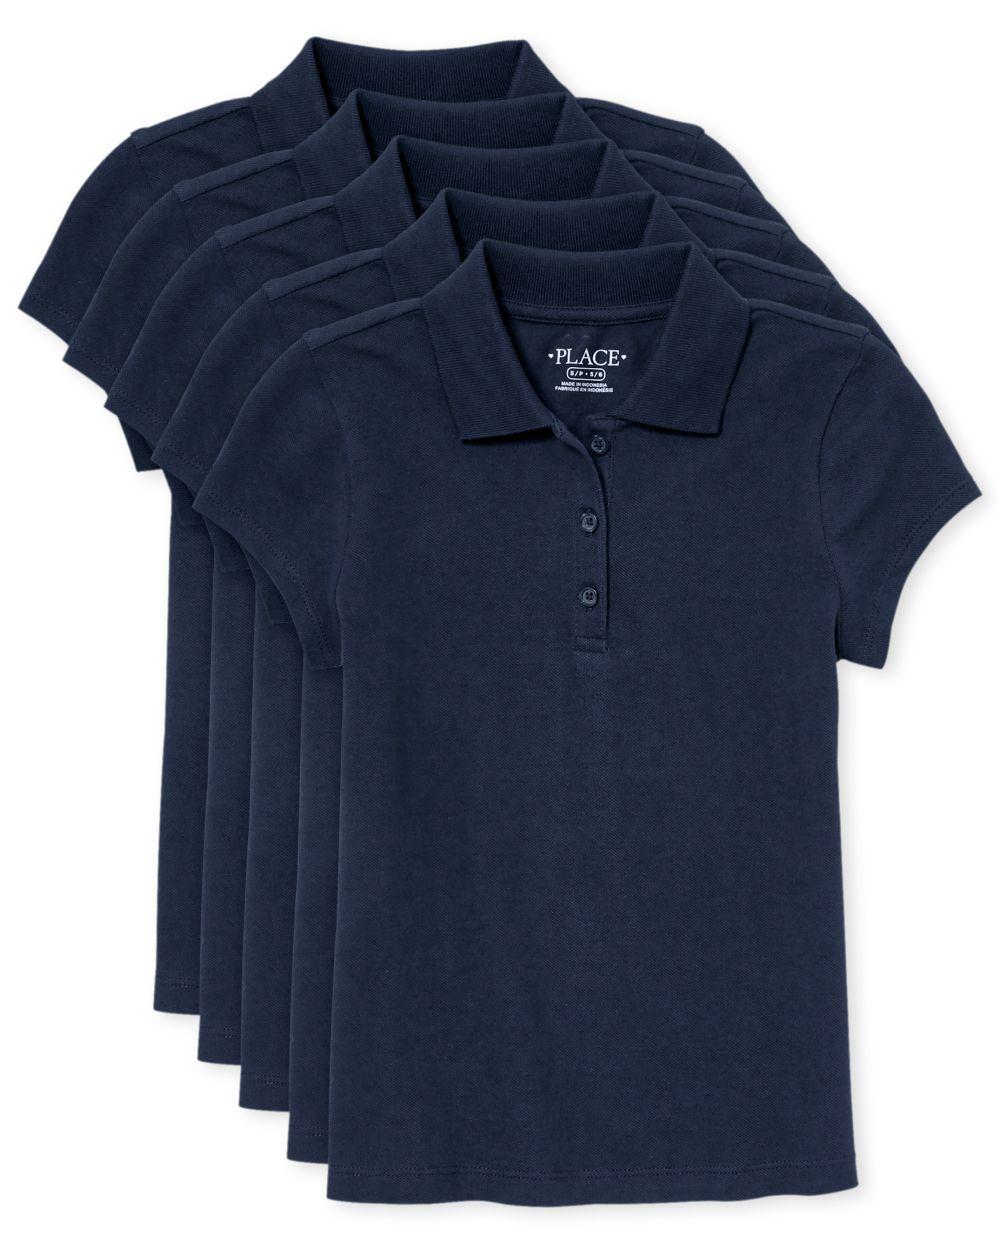 Girls Uniform Pique Polo 5-Pack